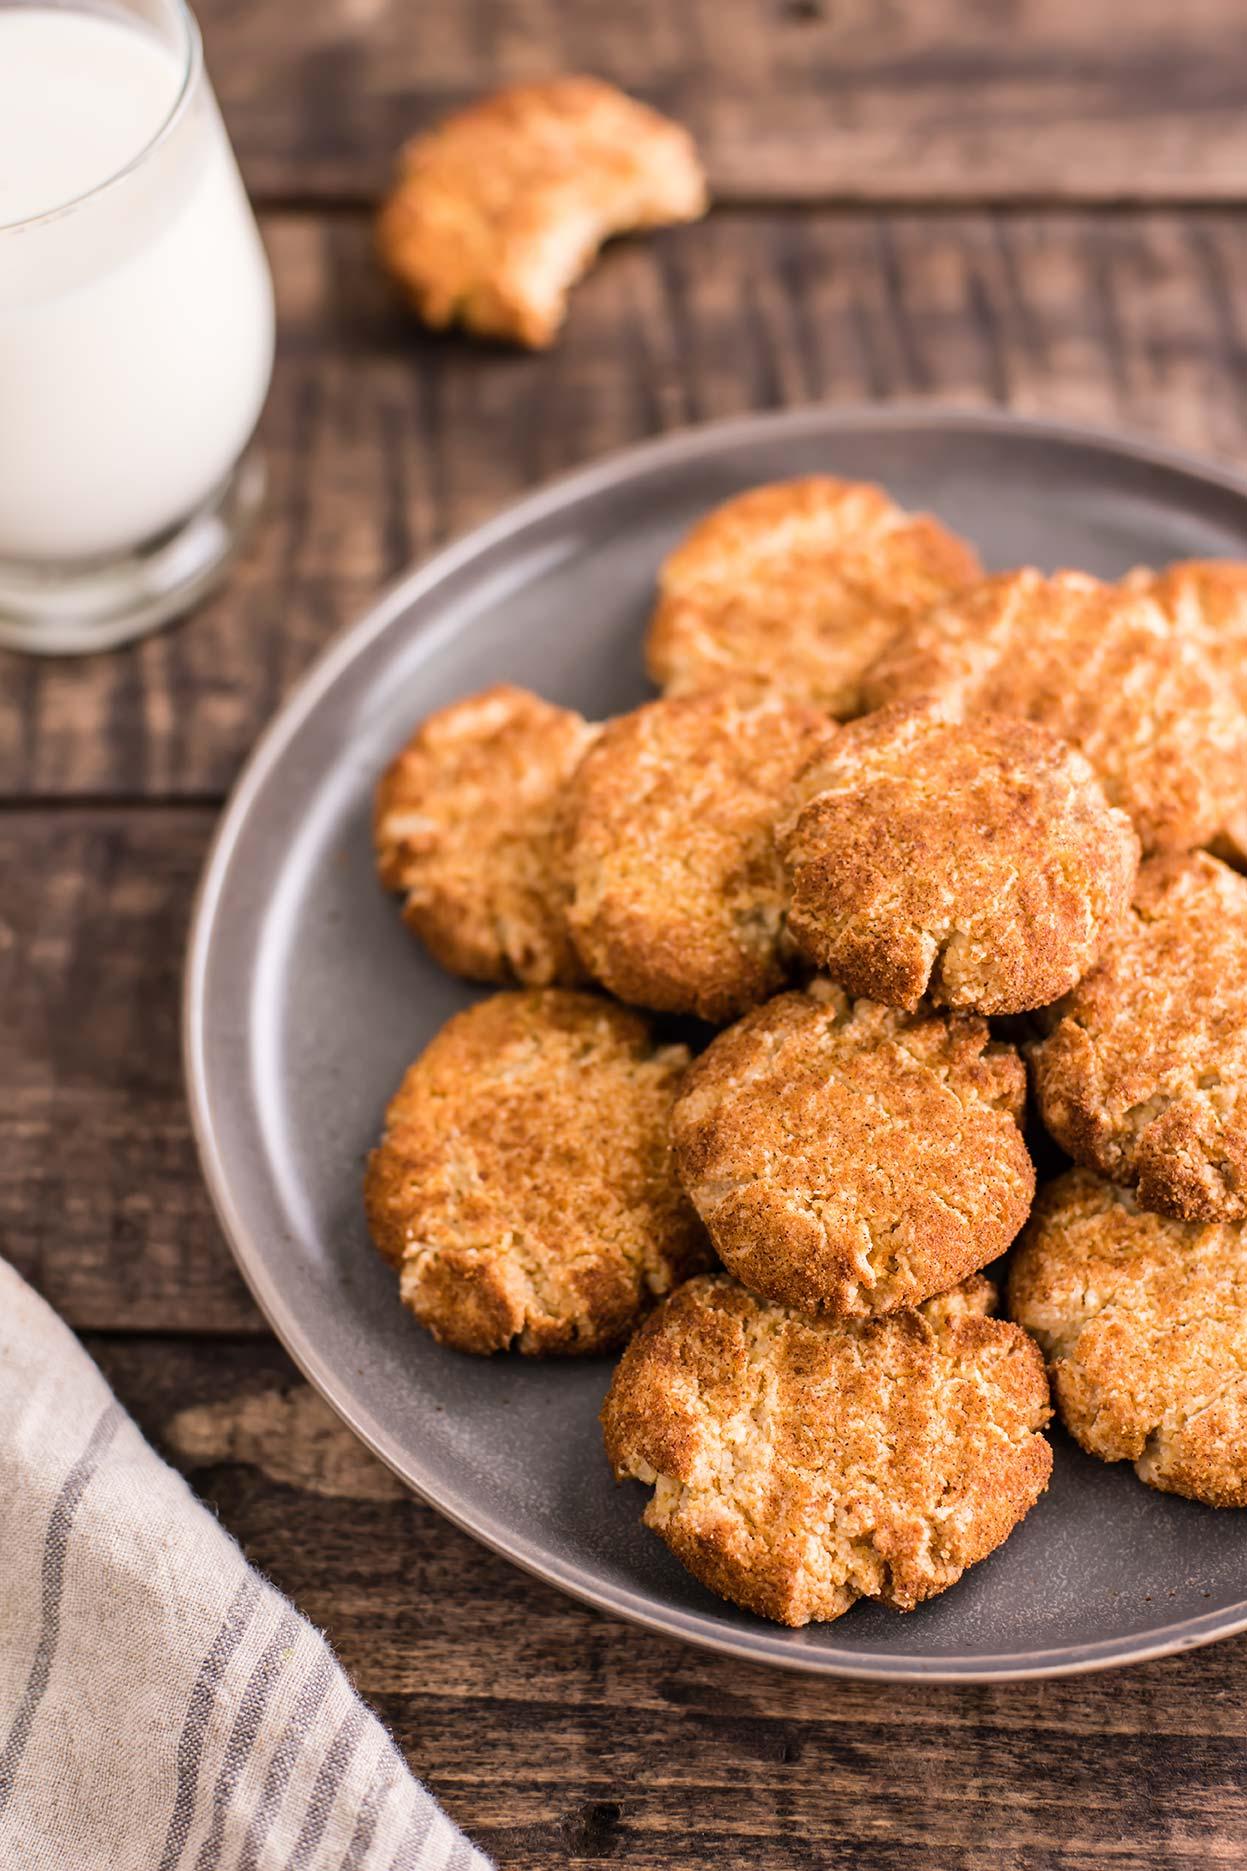 Paleo Almond Flour Snickerdoodle Cookies